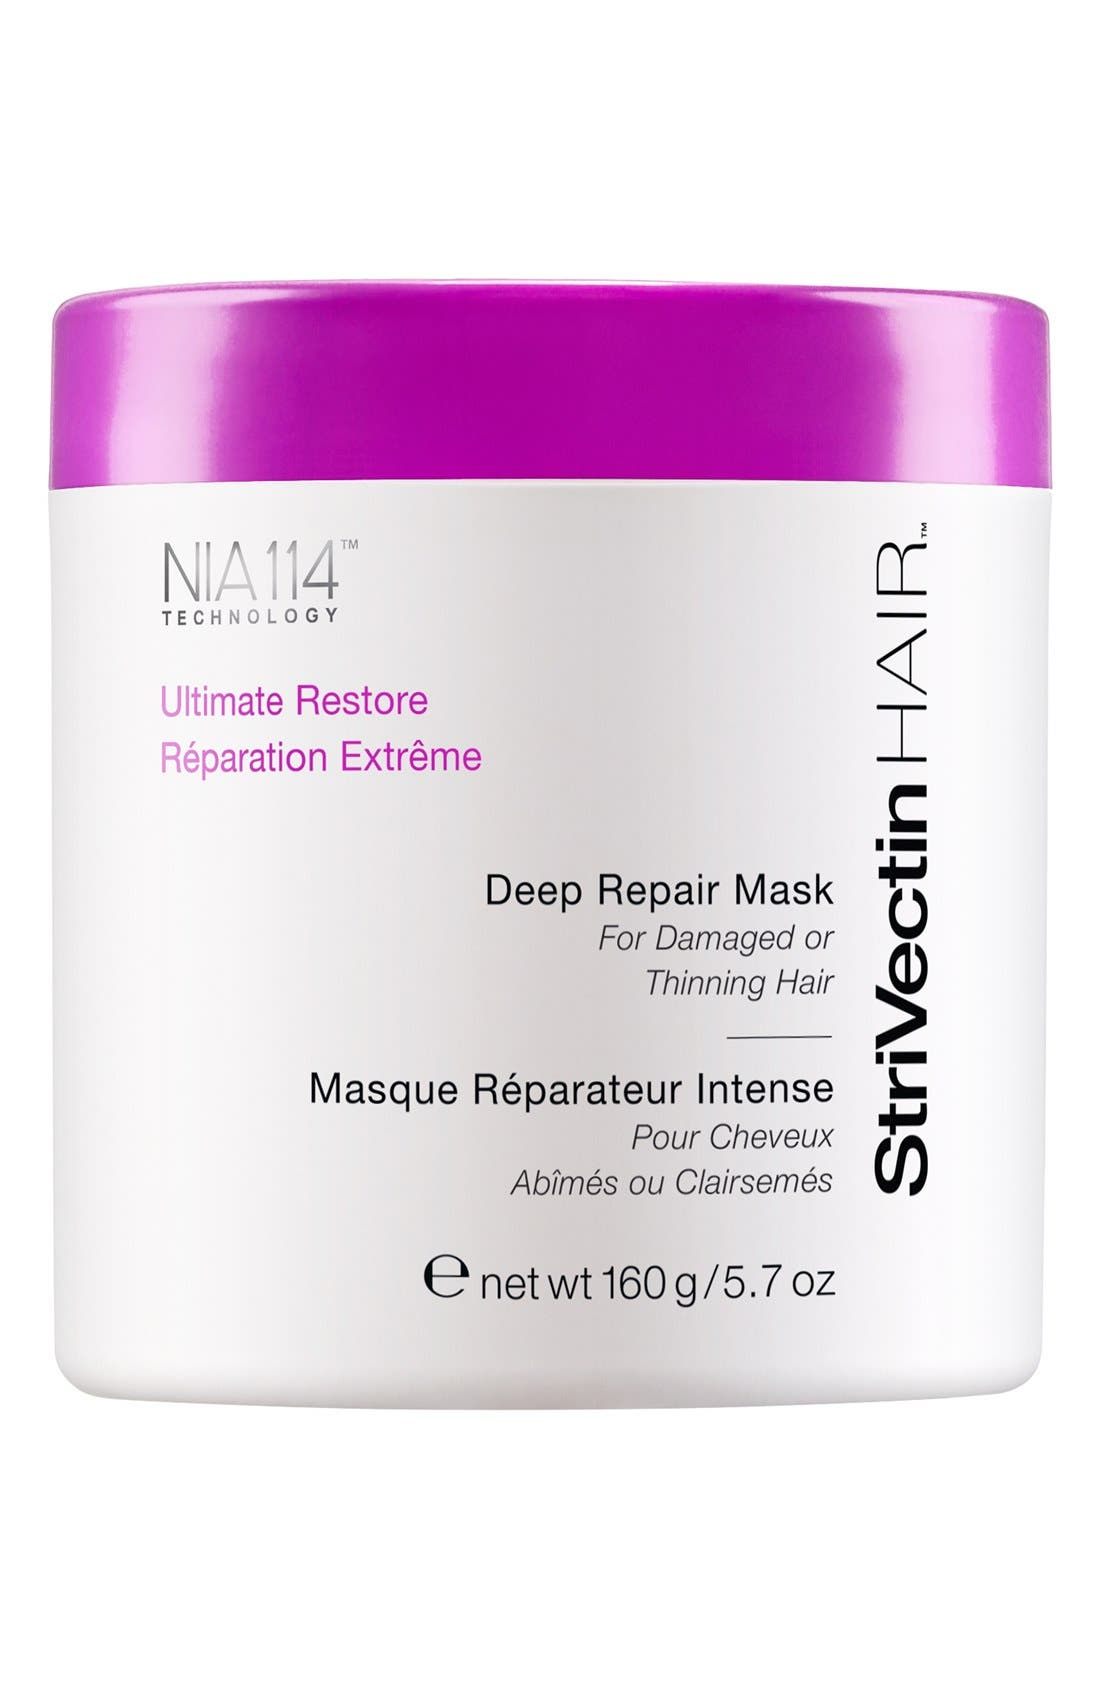 StriVectinHAIR™ 'Ultimate Restore' Deep Repair Mask for Damaged or Thinning Hair